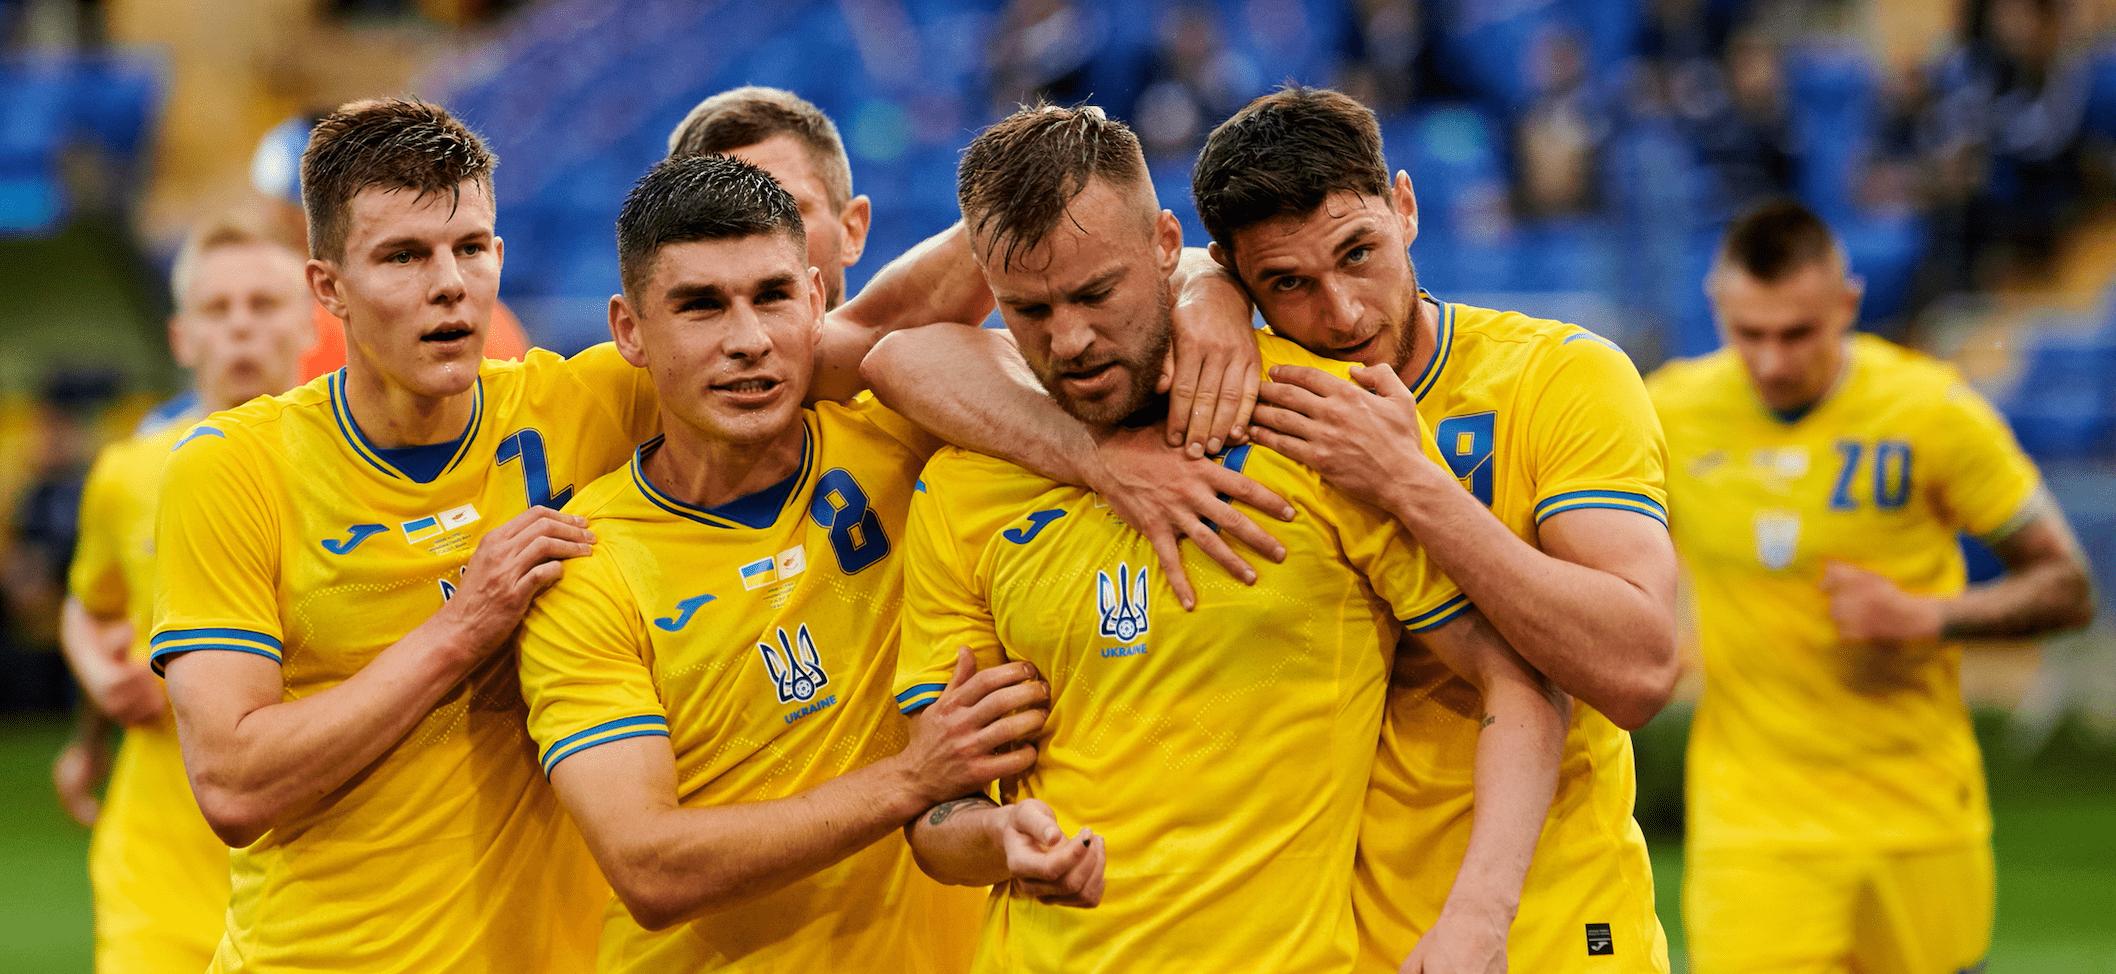 L'Ucraina di Shevchenko si aggrappa a Yarmolenko